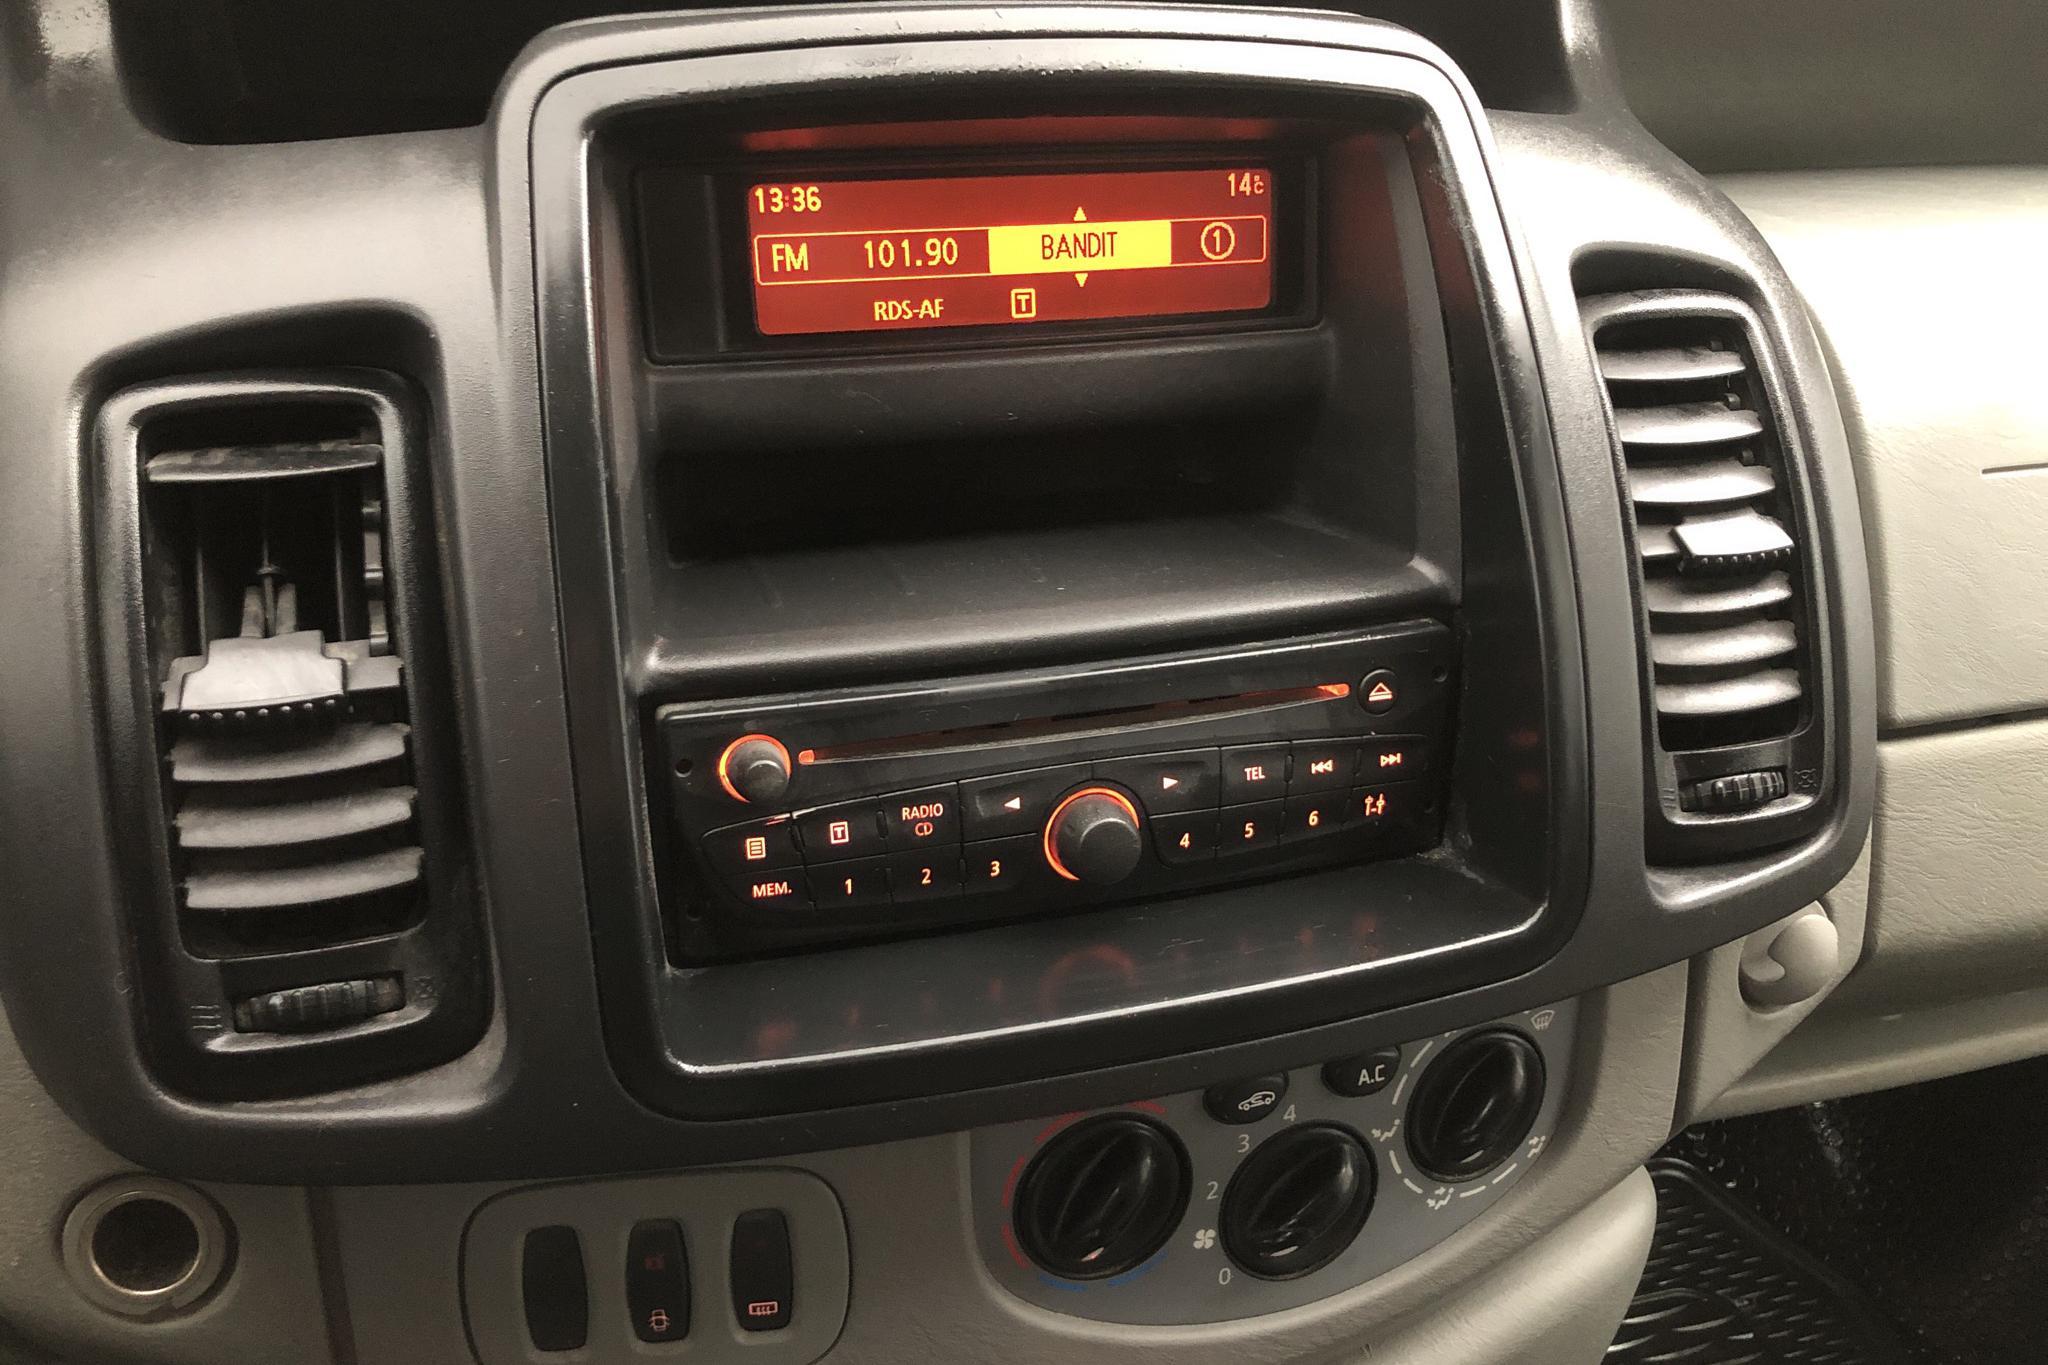 Nissan Primastar 2.0 dCi (114hk) - 185 600 km - Manual - white - 2014